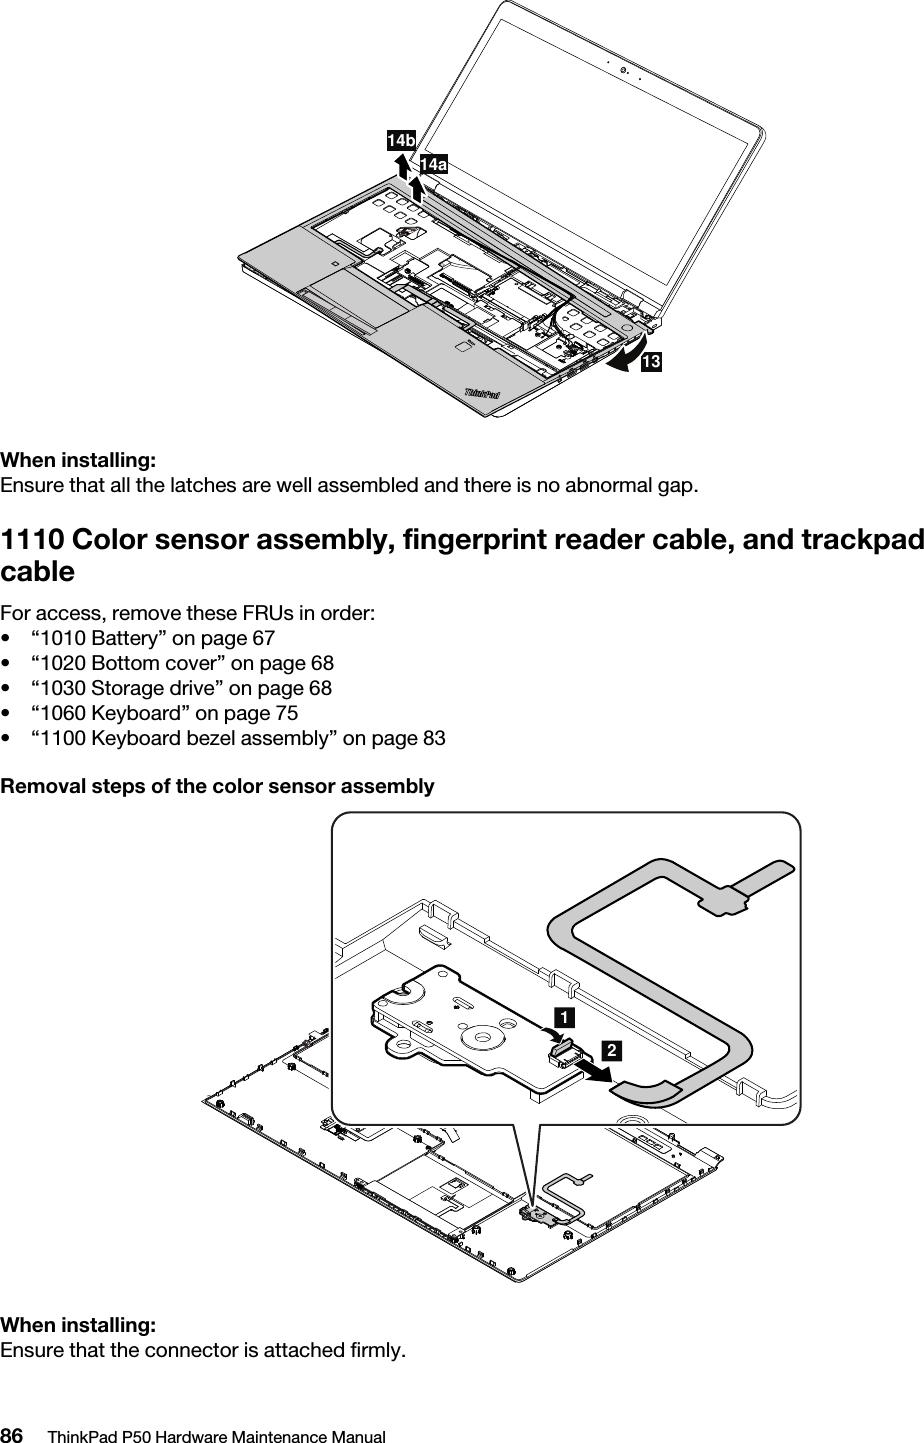 Lenovo P50 Hmm En Sp40J71944 03 ThinkPad Hardware